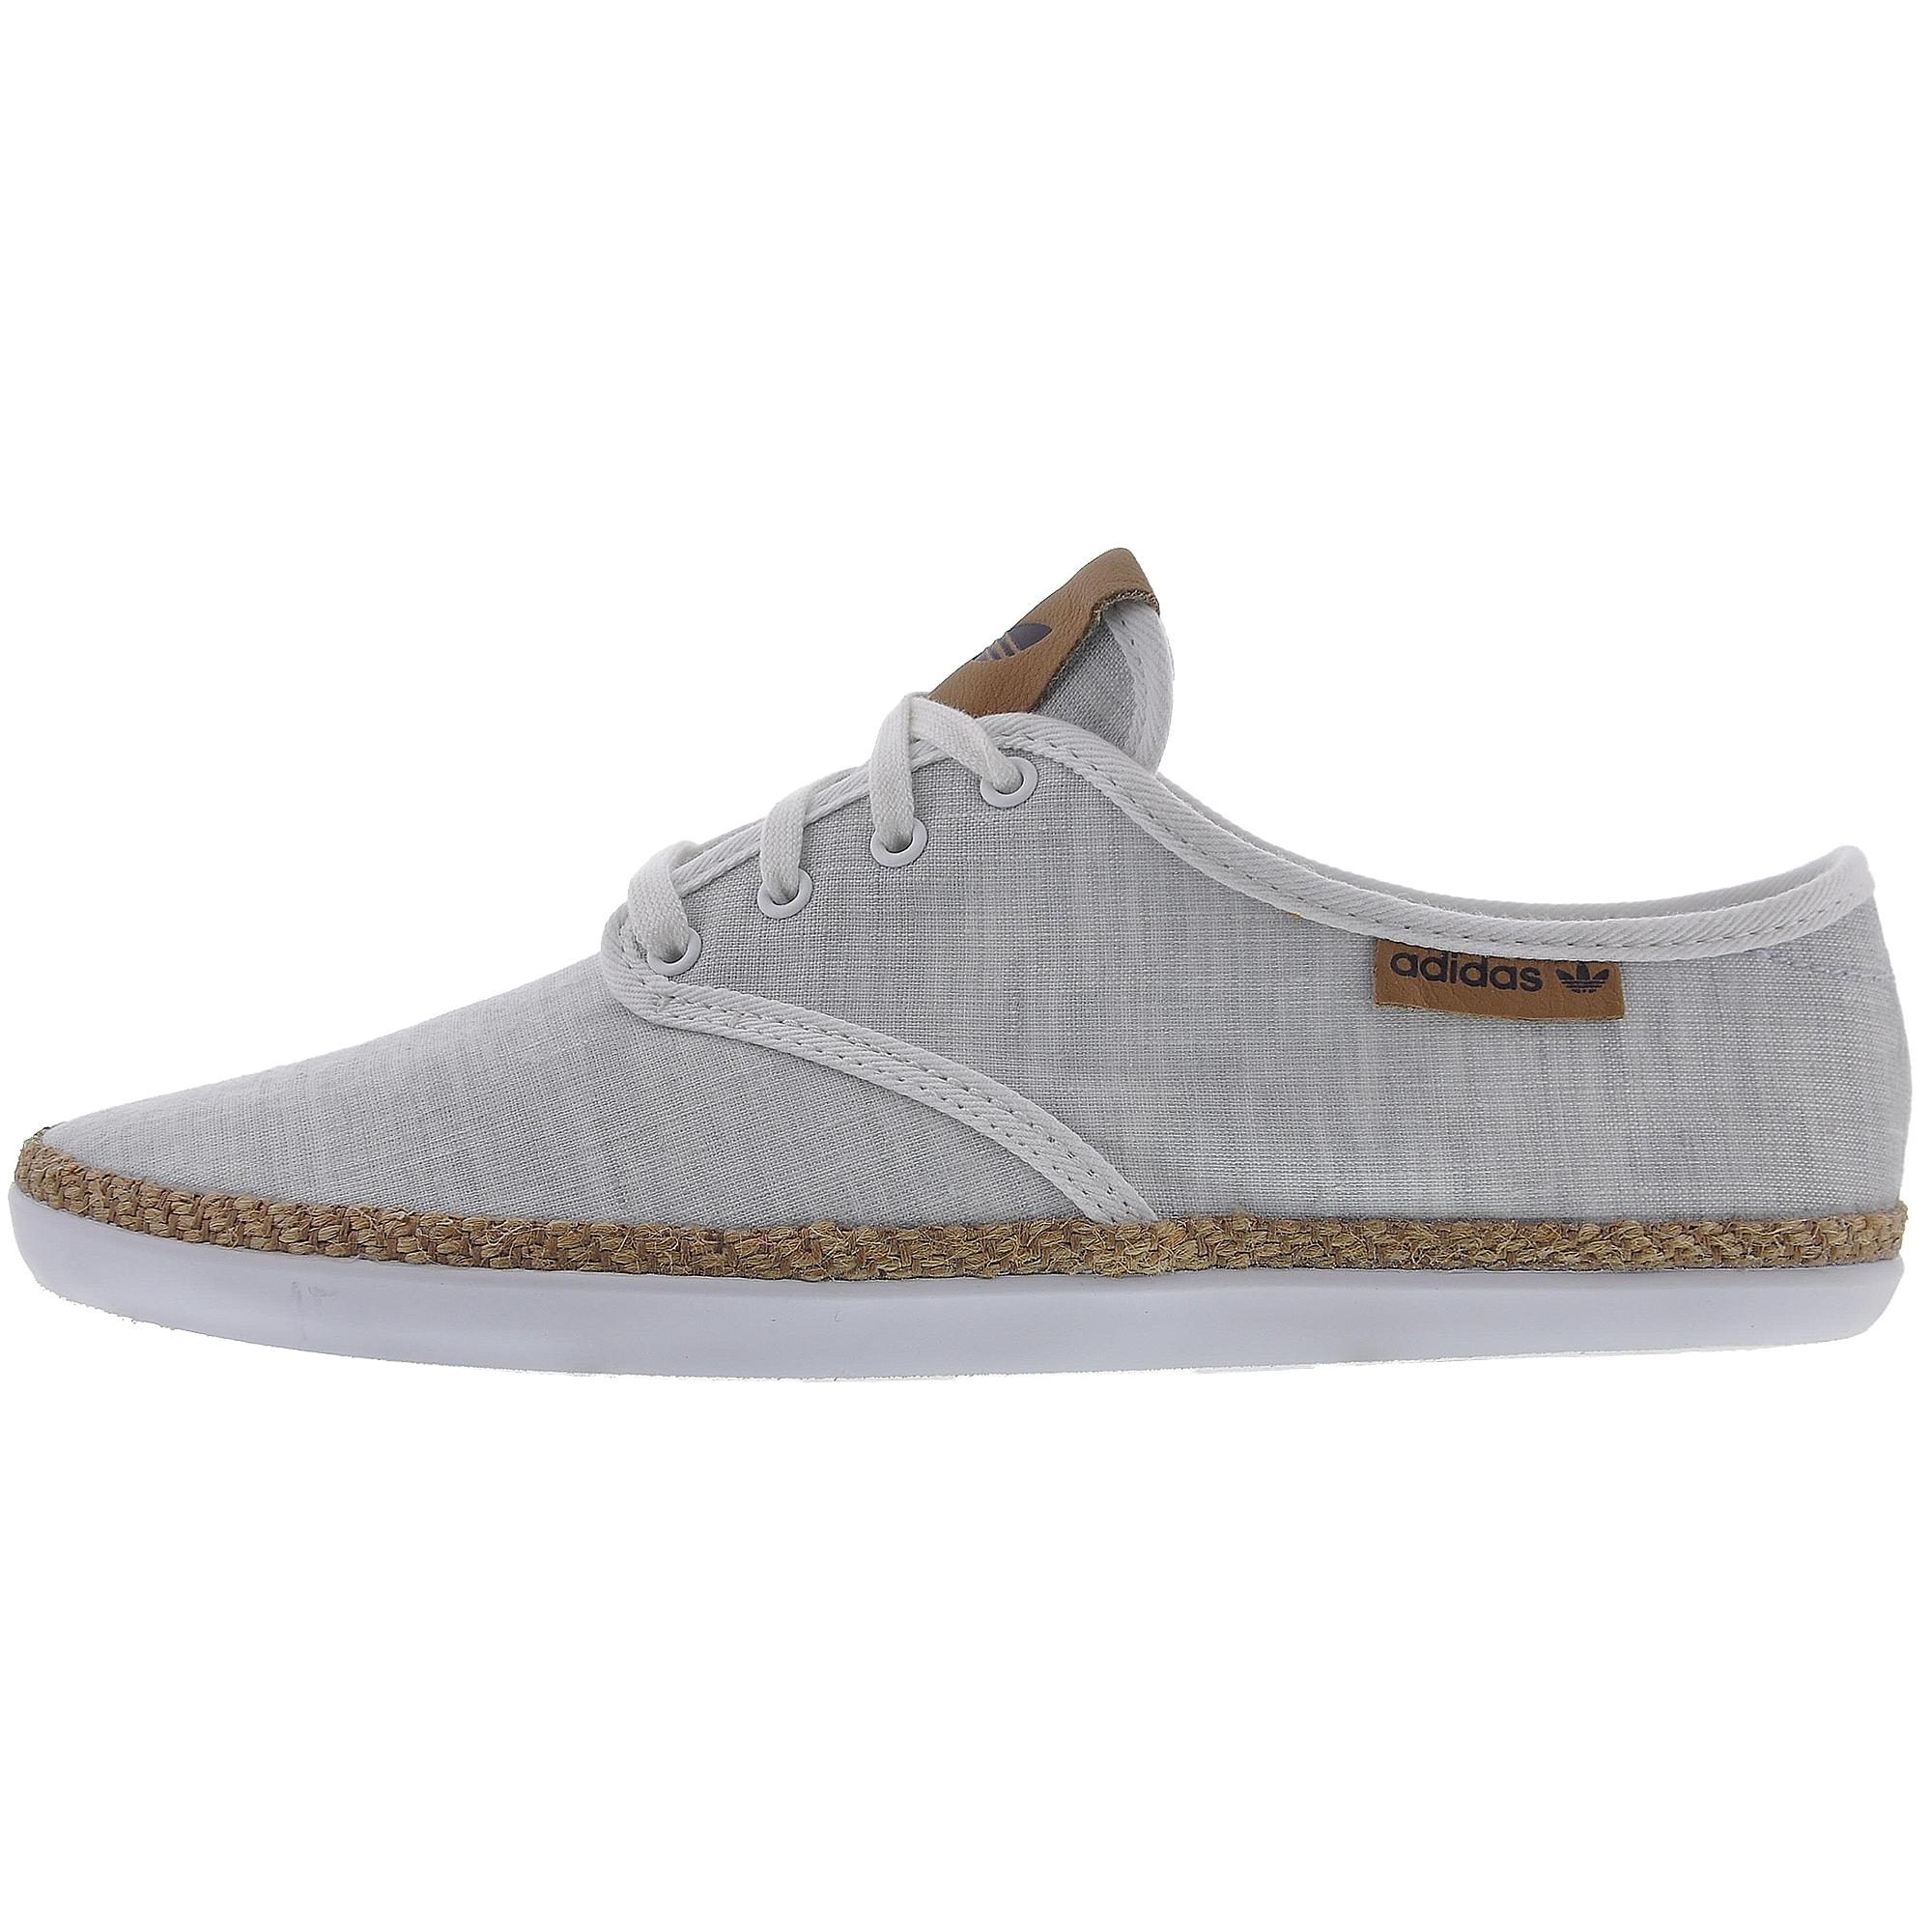 adidas Adria Ps Spor Ayakkabı  M19546 - Barcin.com 6fdb08a111ff